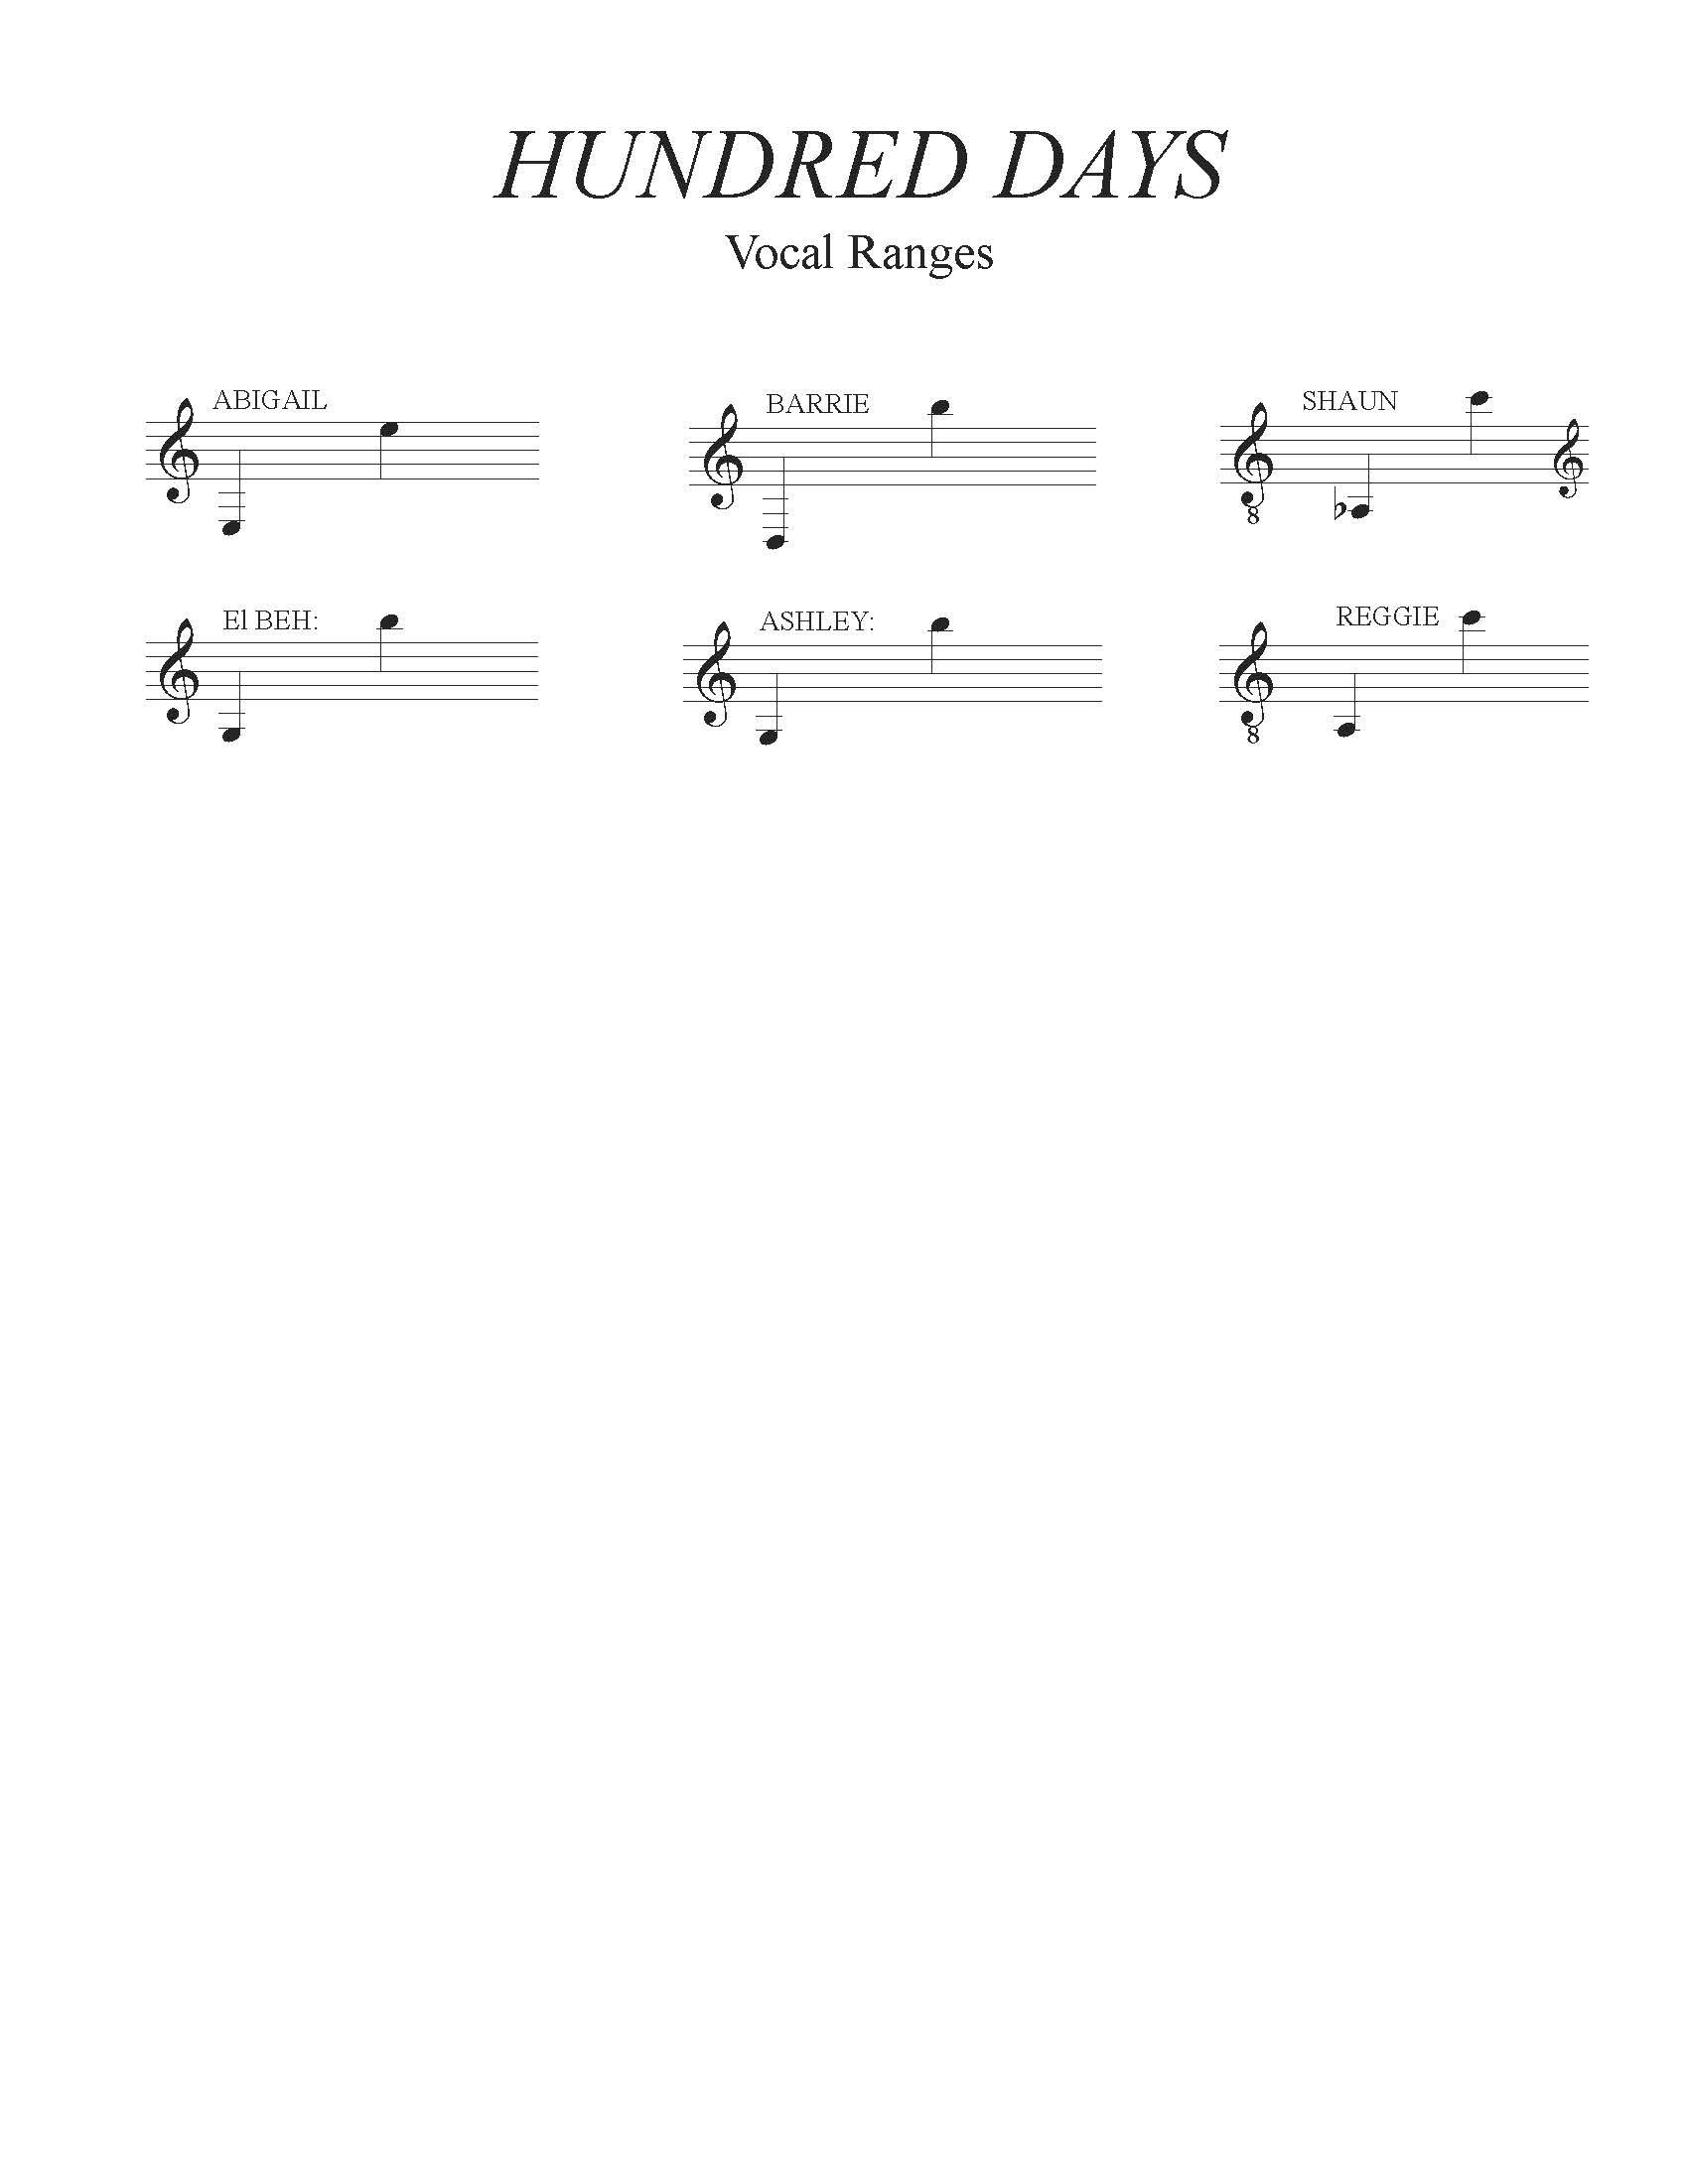 Hundred Days Vocal Ranges